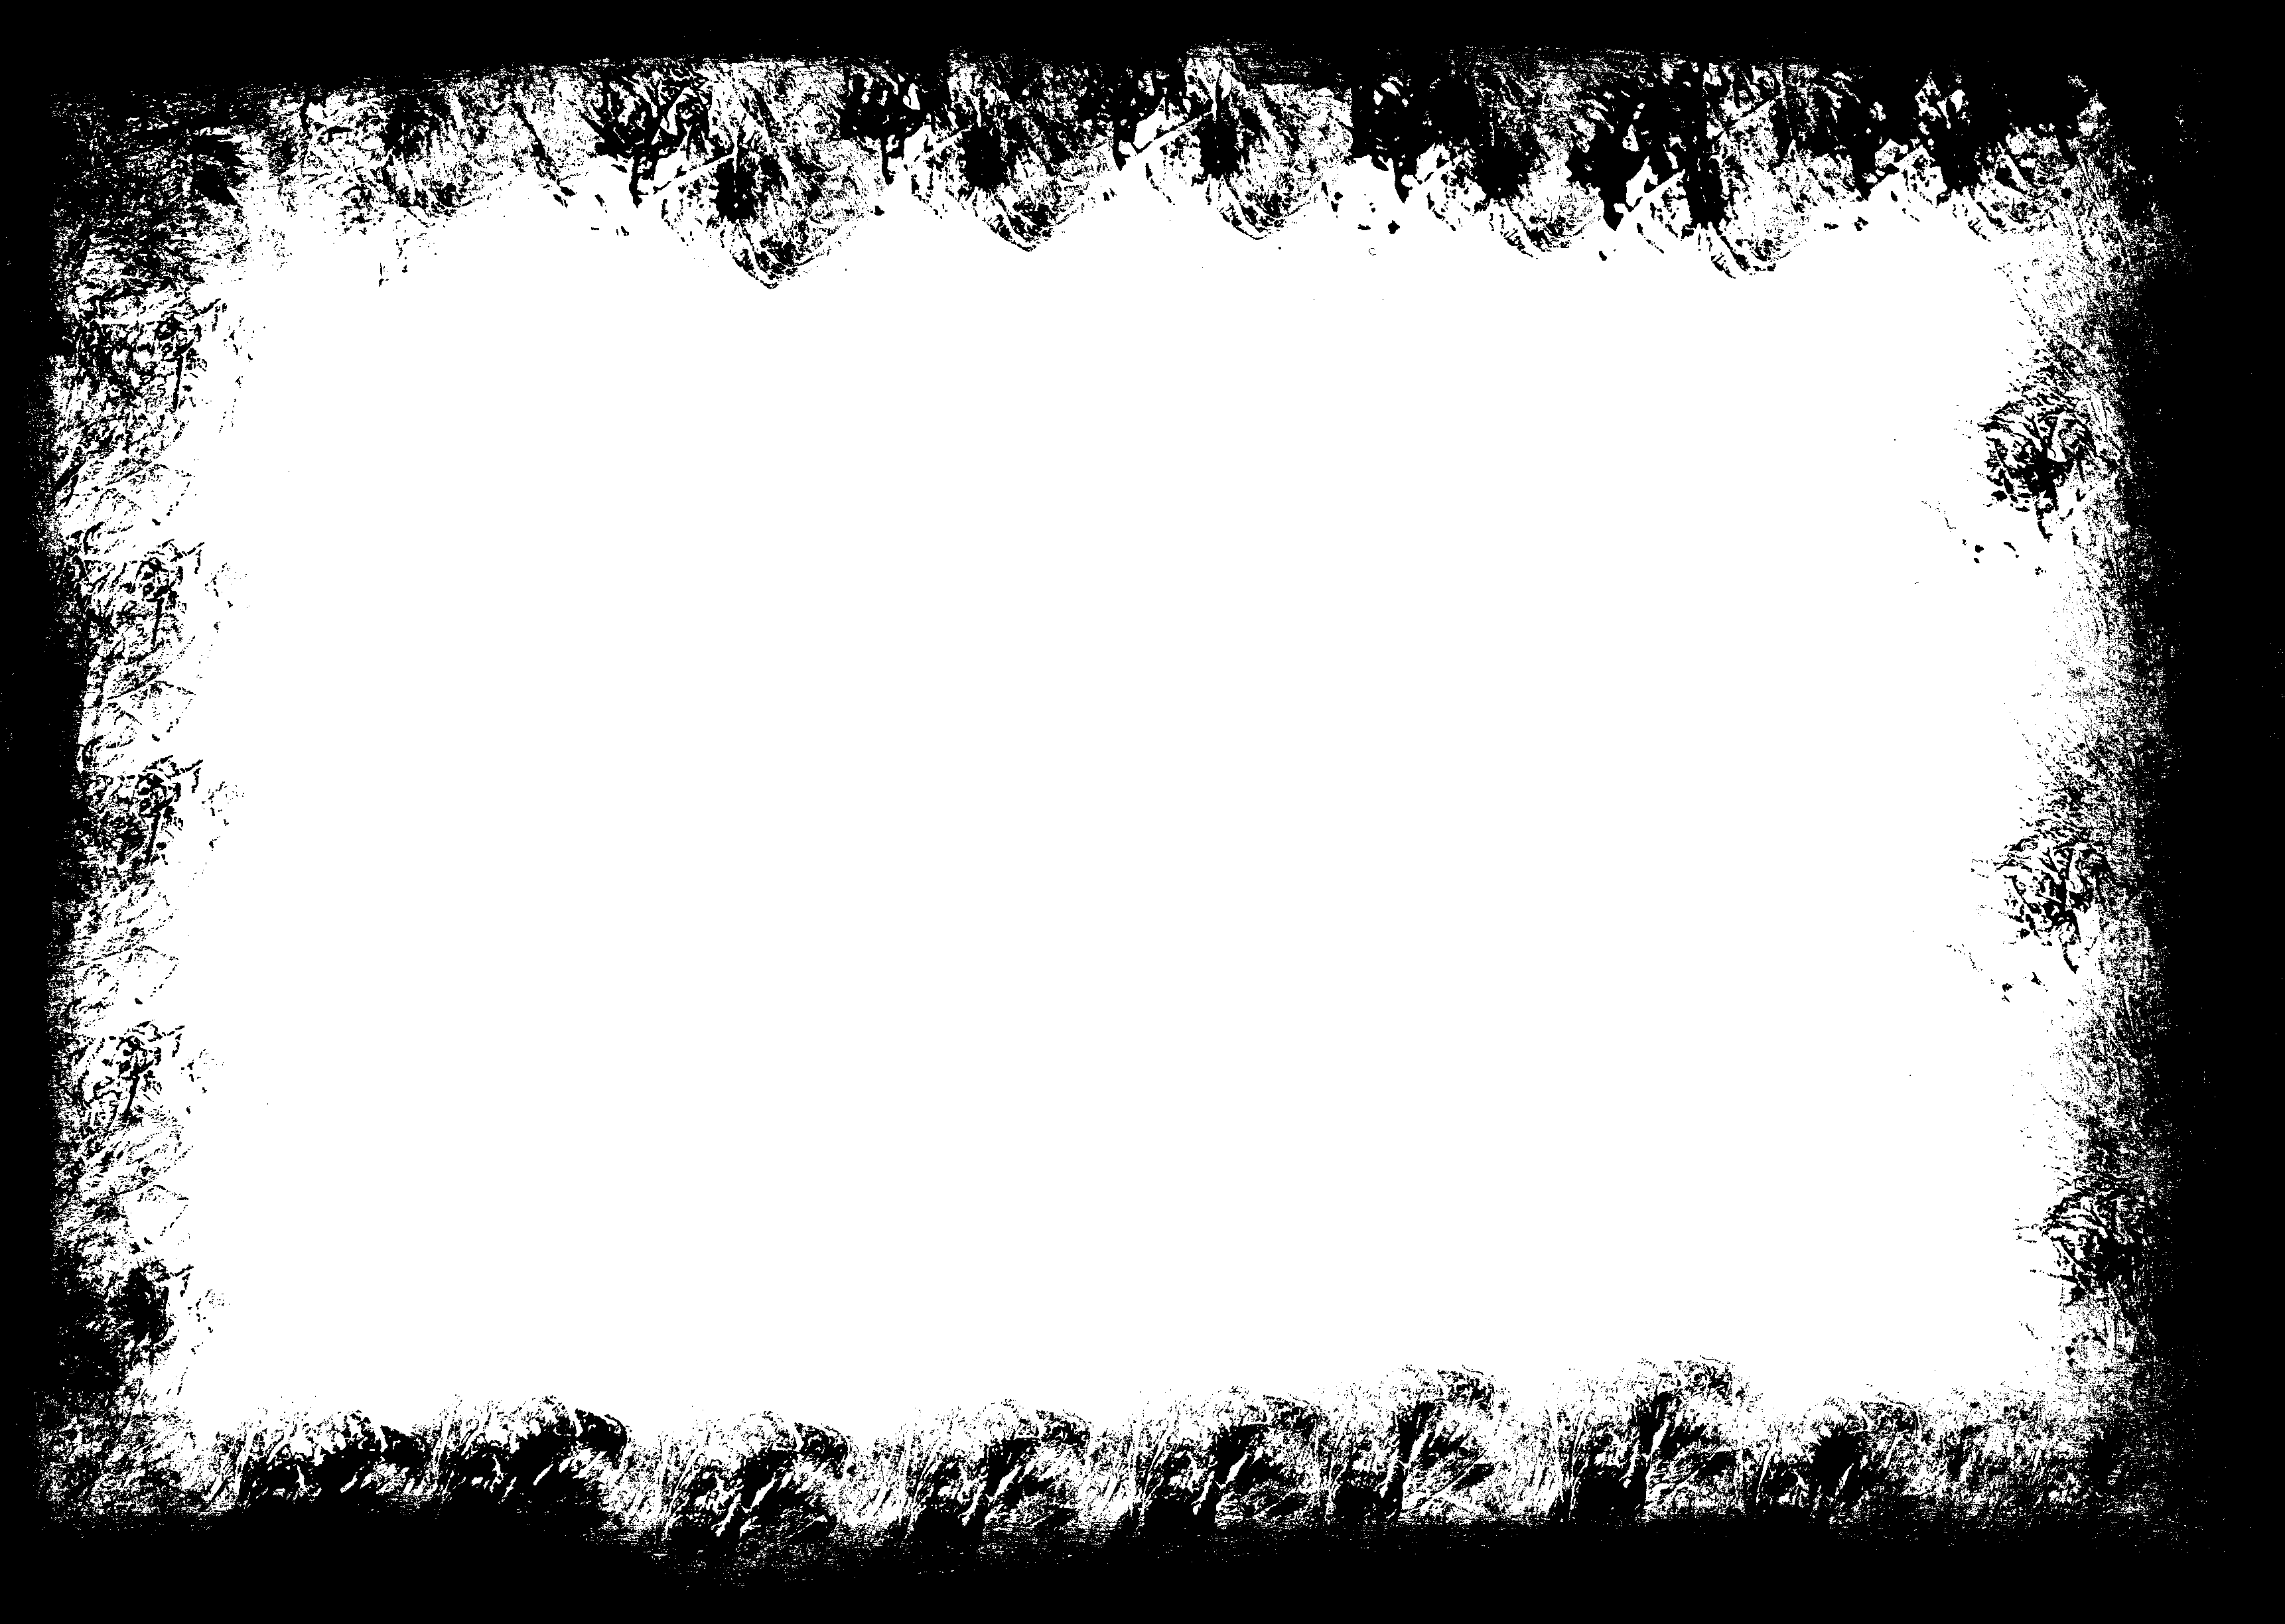 transparent black border - 840×637